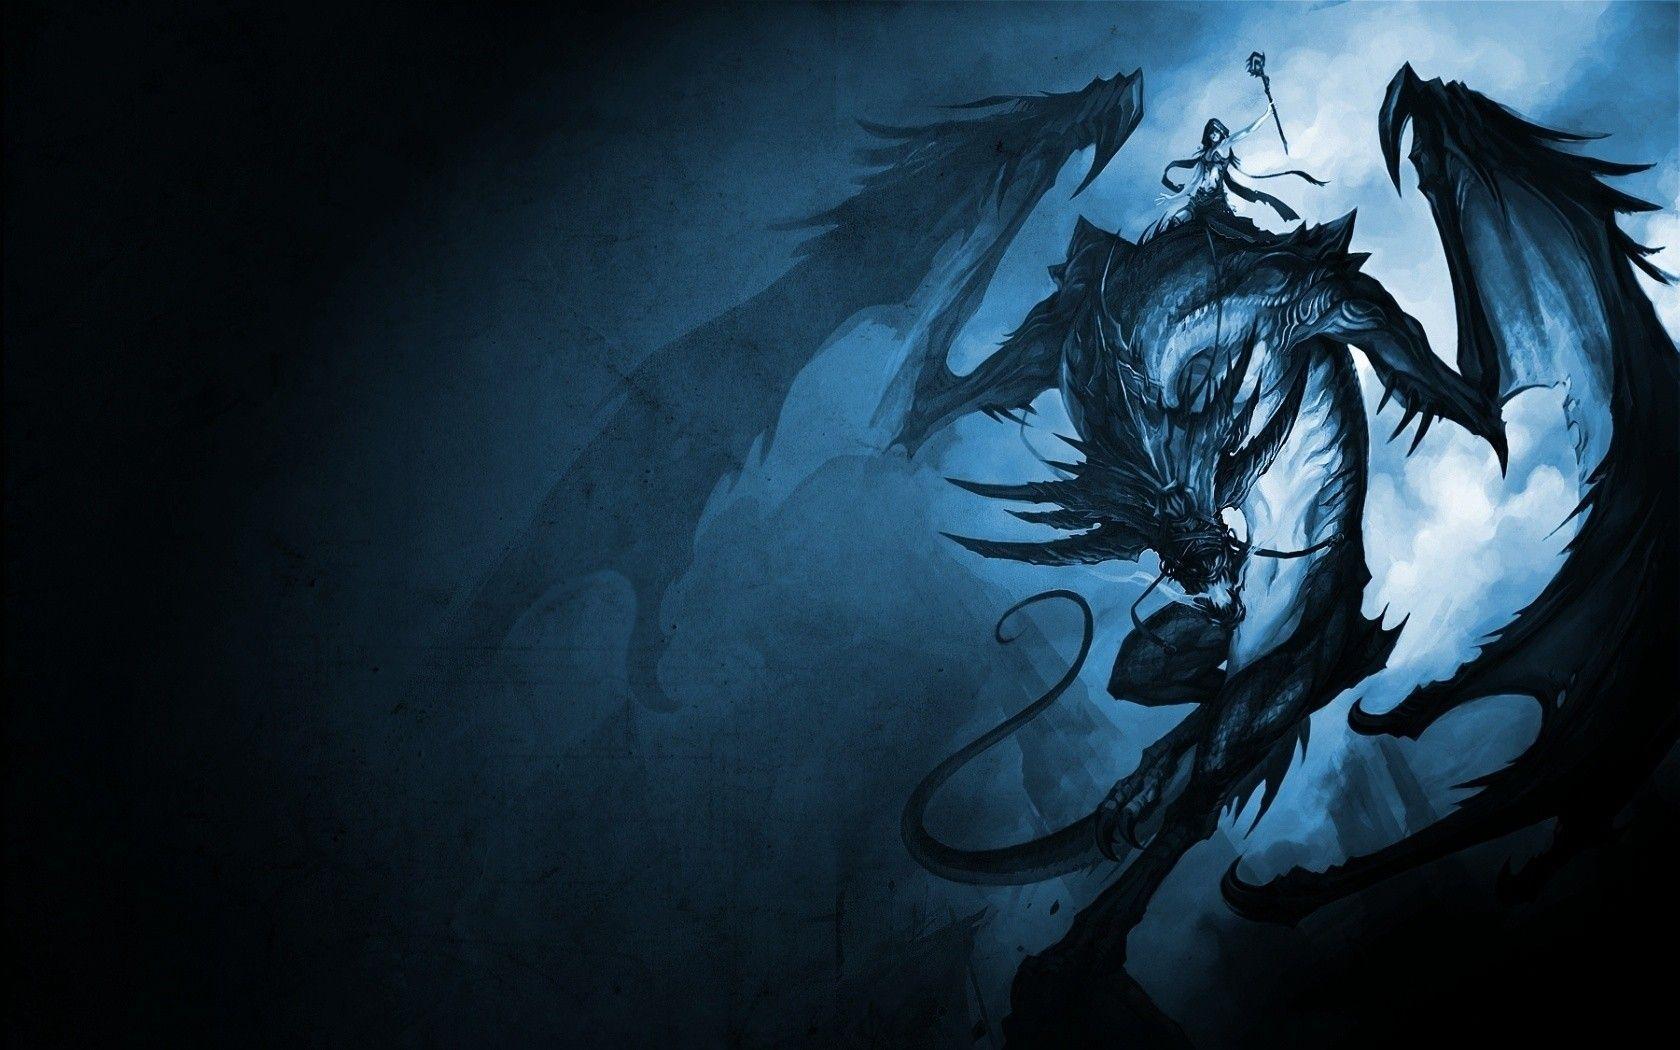 Dark Dragon Wallpapers Top Free Dark Dragon Backgrounds